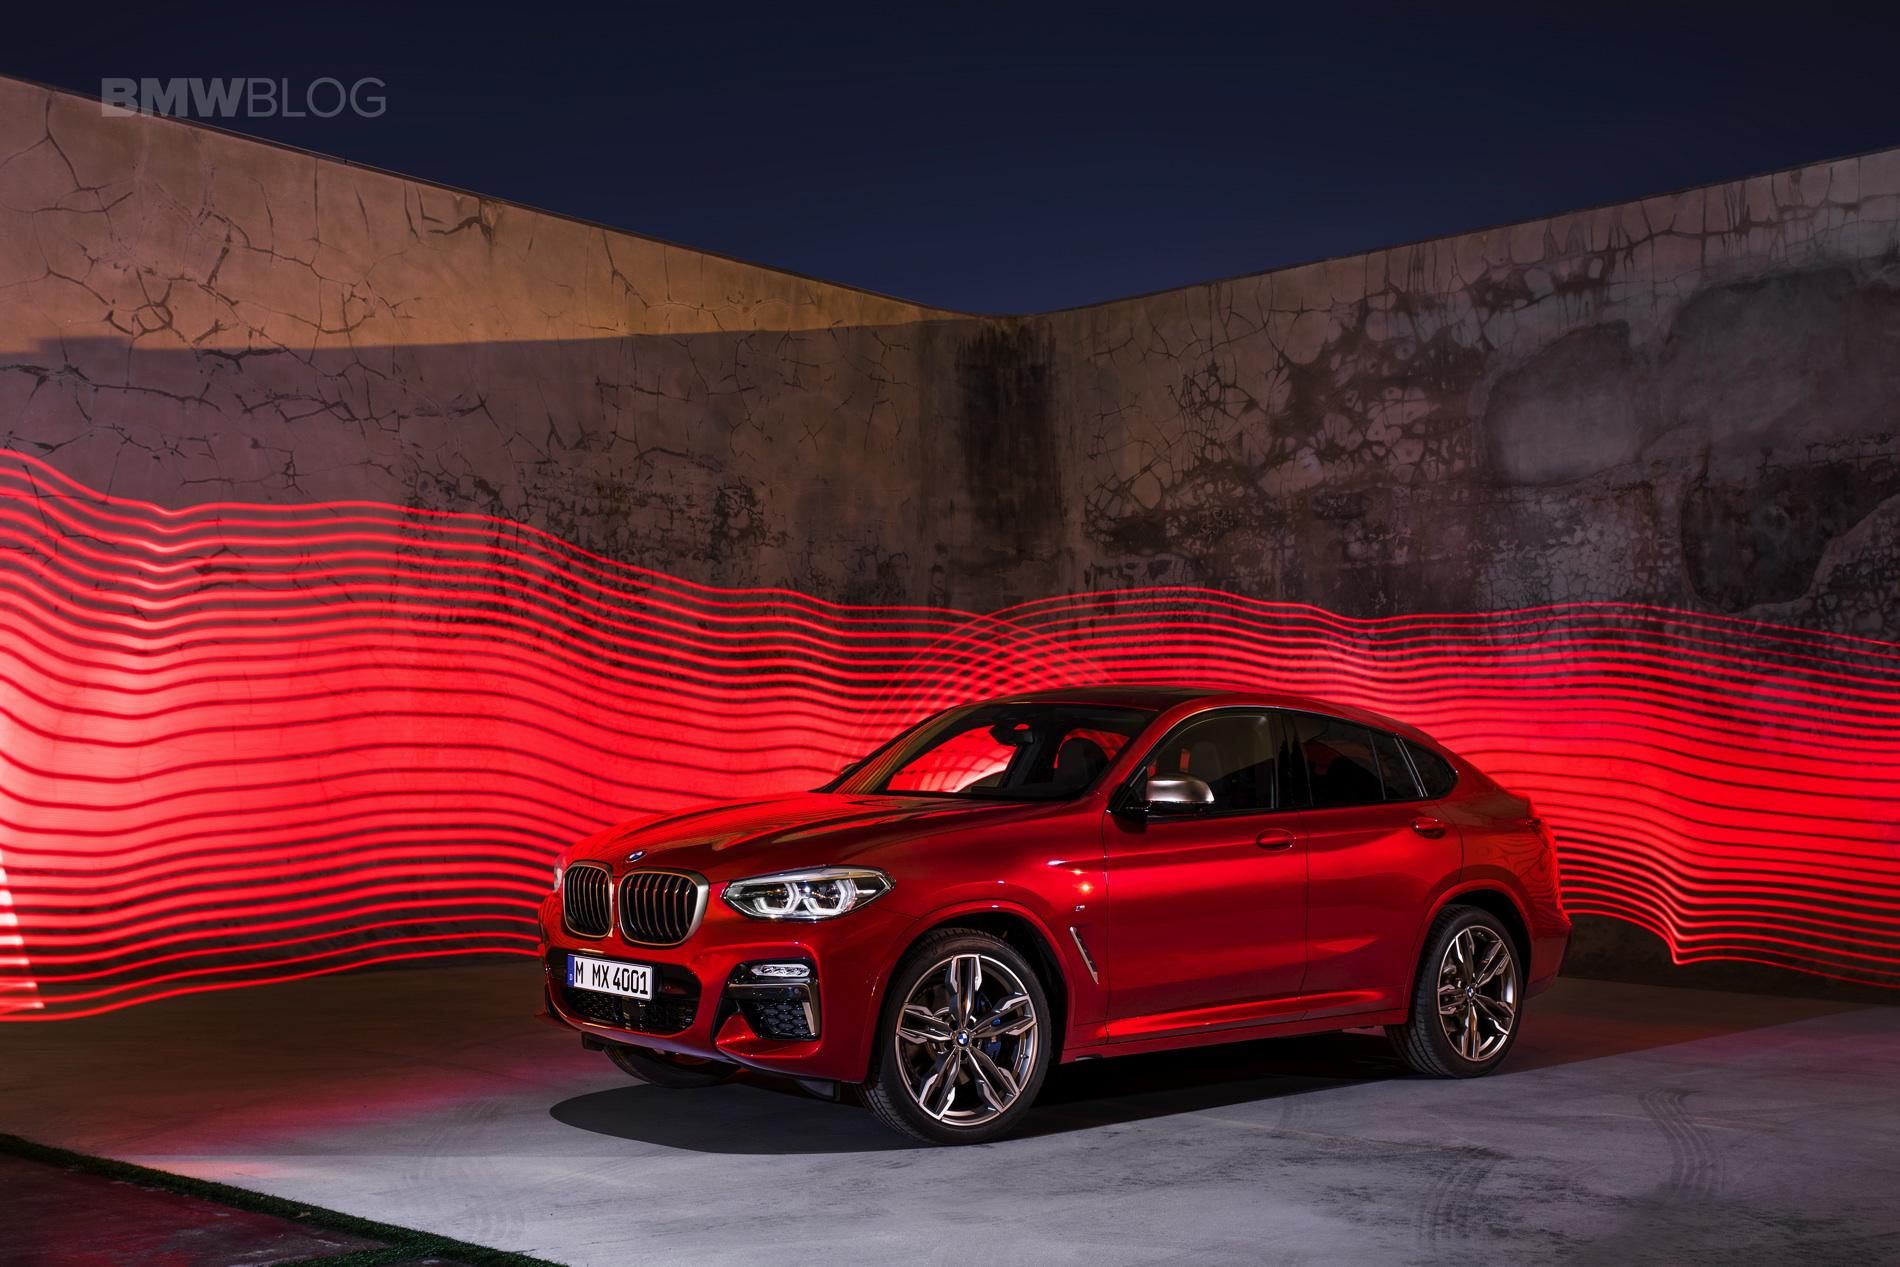 New 2018 BMW X4 M40d exterior design 42